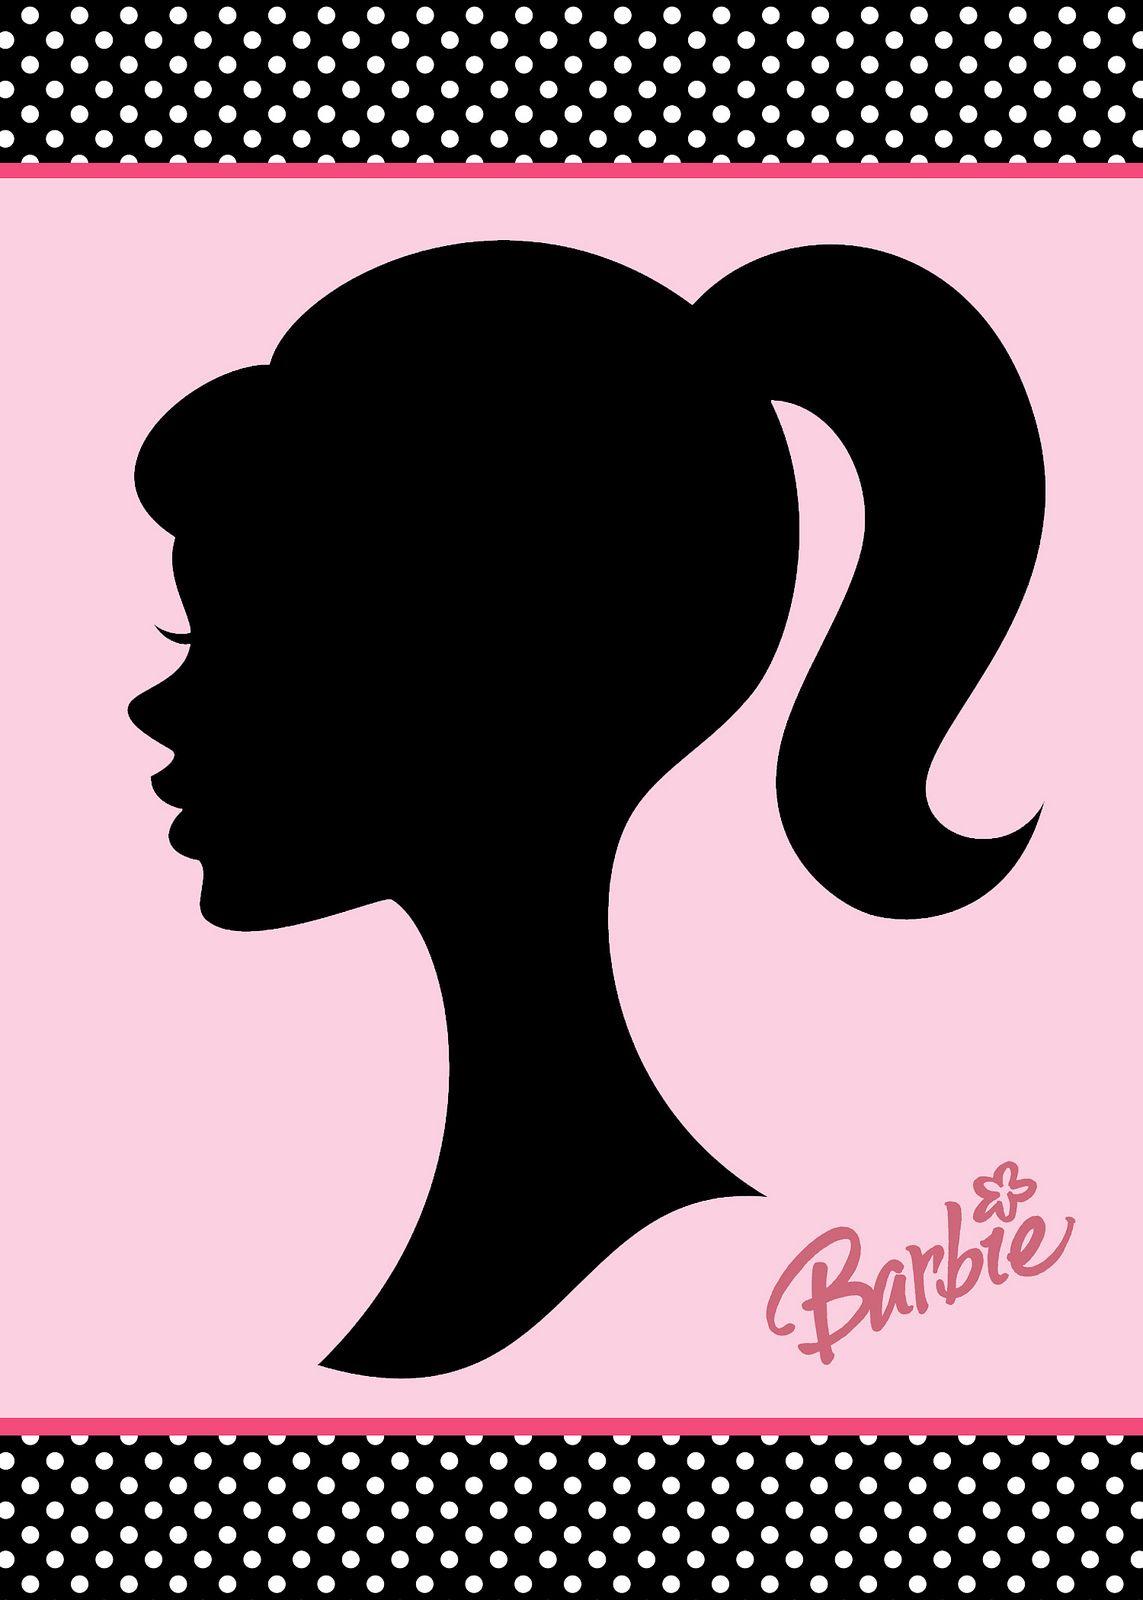 barbieinvite barbie party barbie birthday and barbie